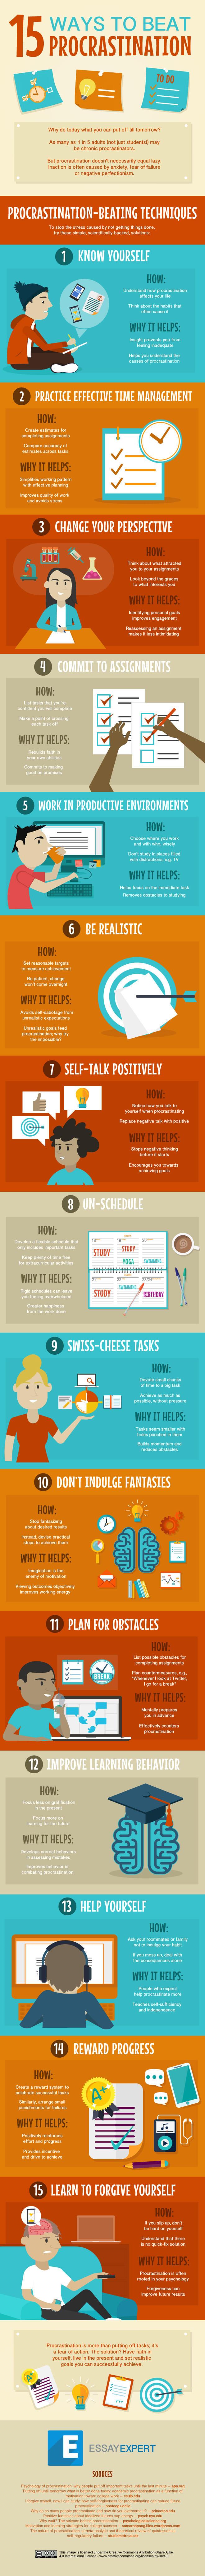 Infographic: 15 ways to beat procrastination